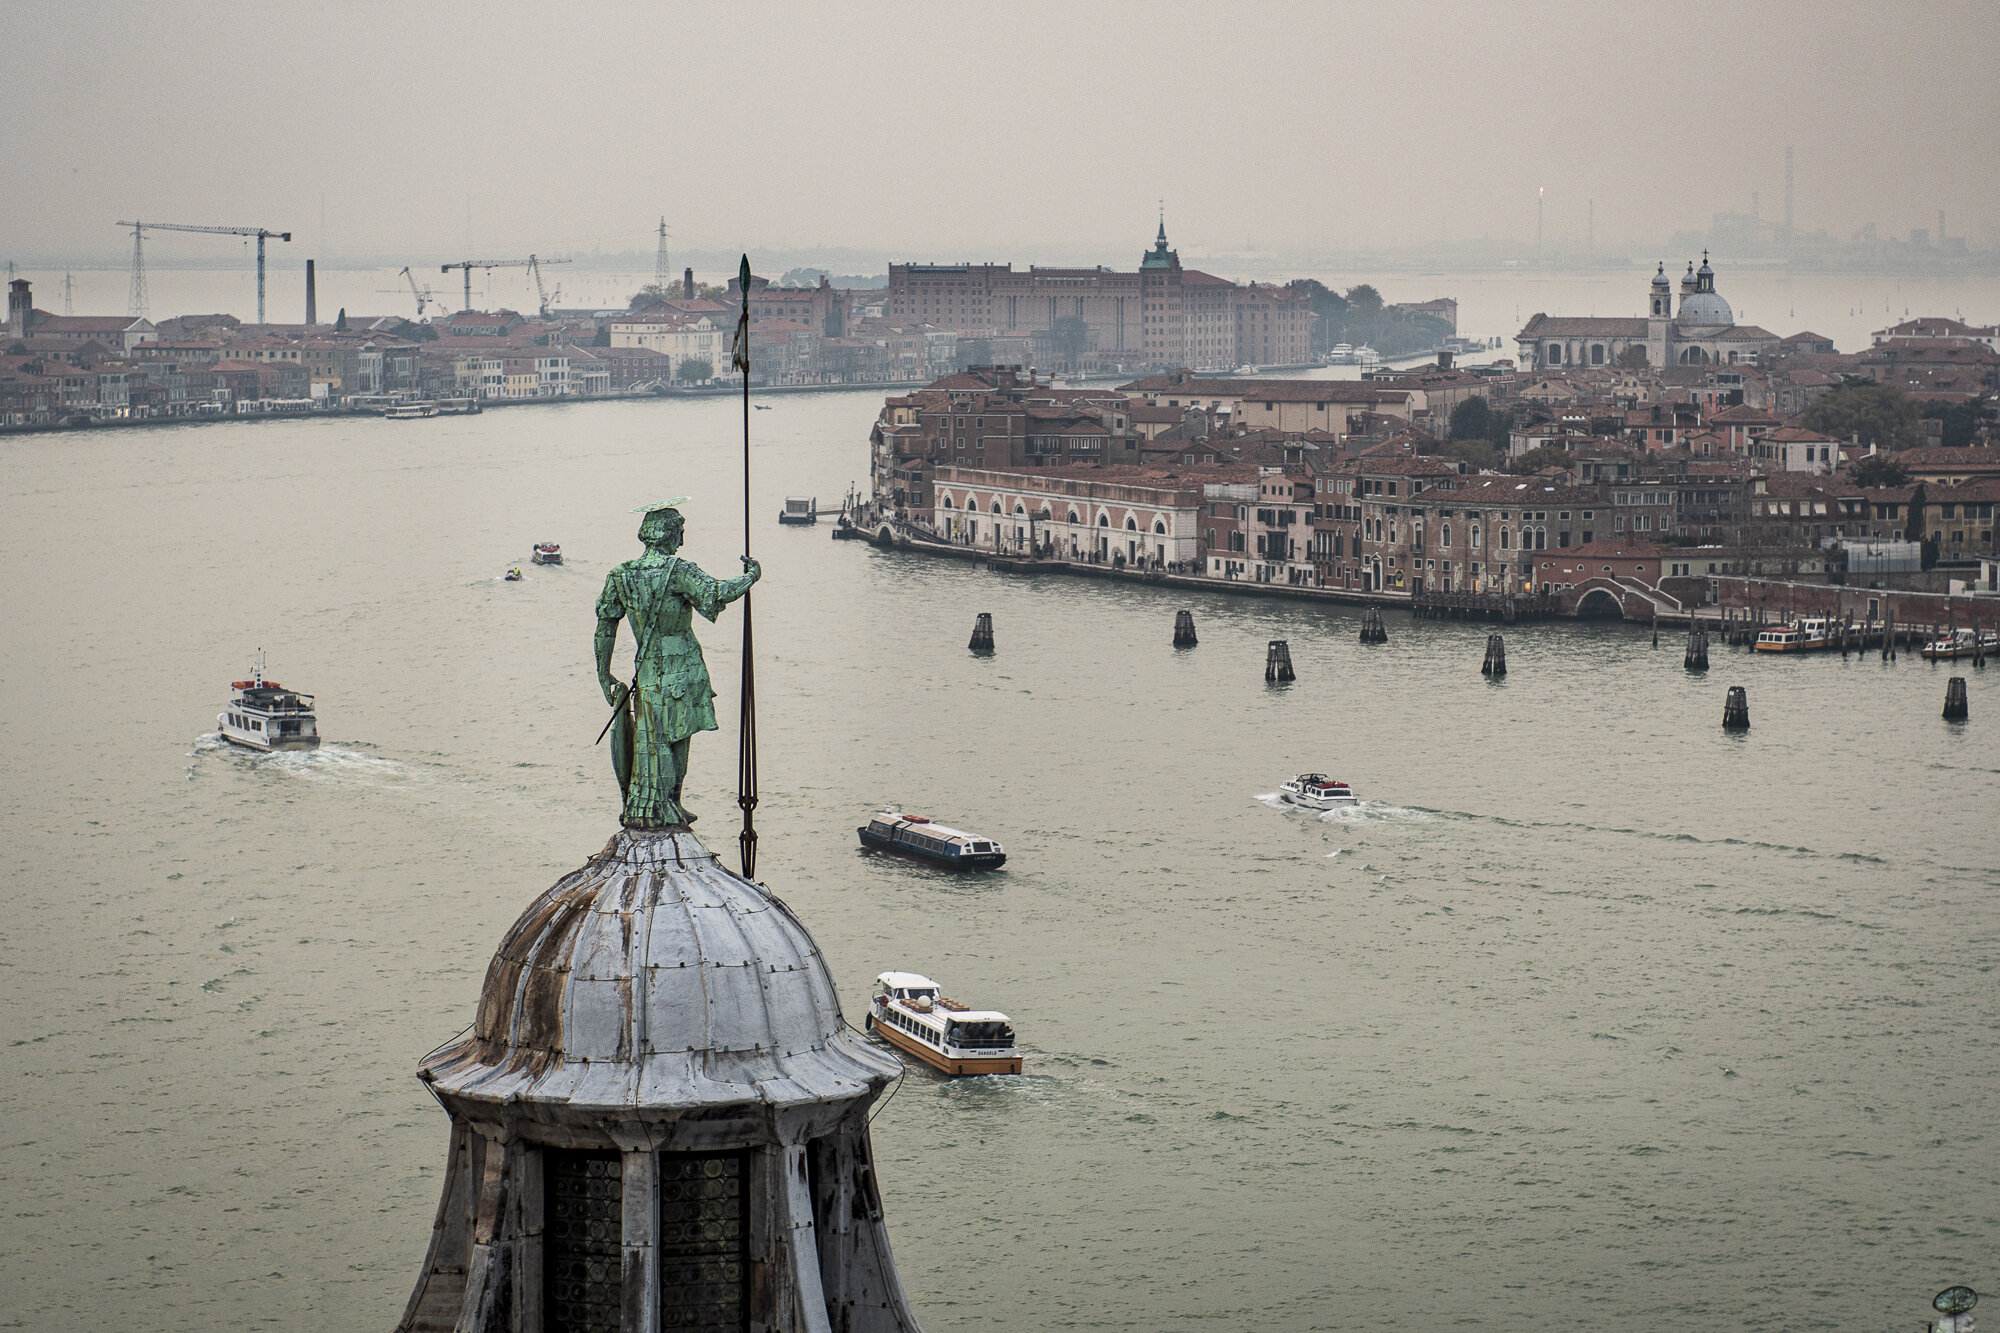 Venice from Isola de San Giorgio Maggiore  PHOTOGRAPHY: ALEXANDER J.E. BRADLEY • NIKON D500 • AF-S NIKKOR 24-70MM Ƒ/2.8G ED